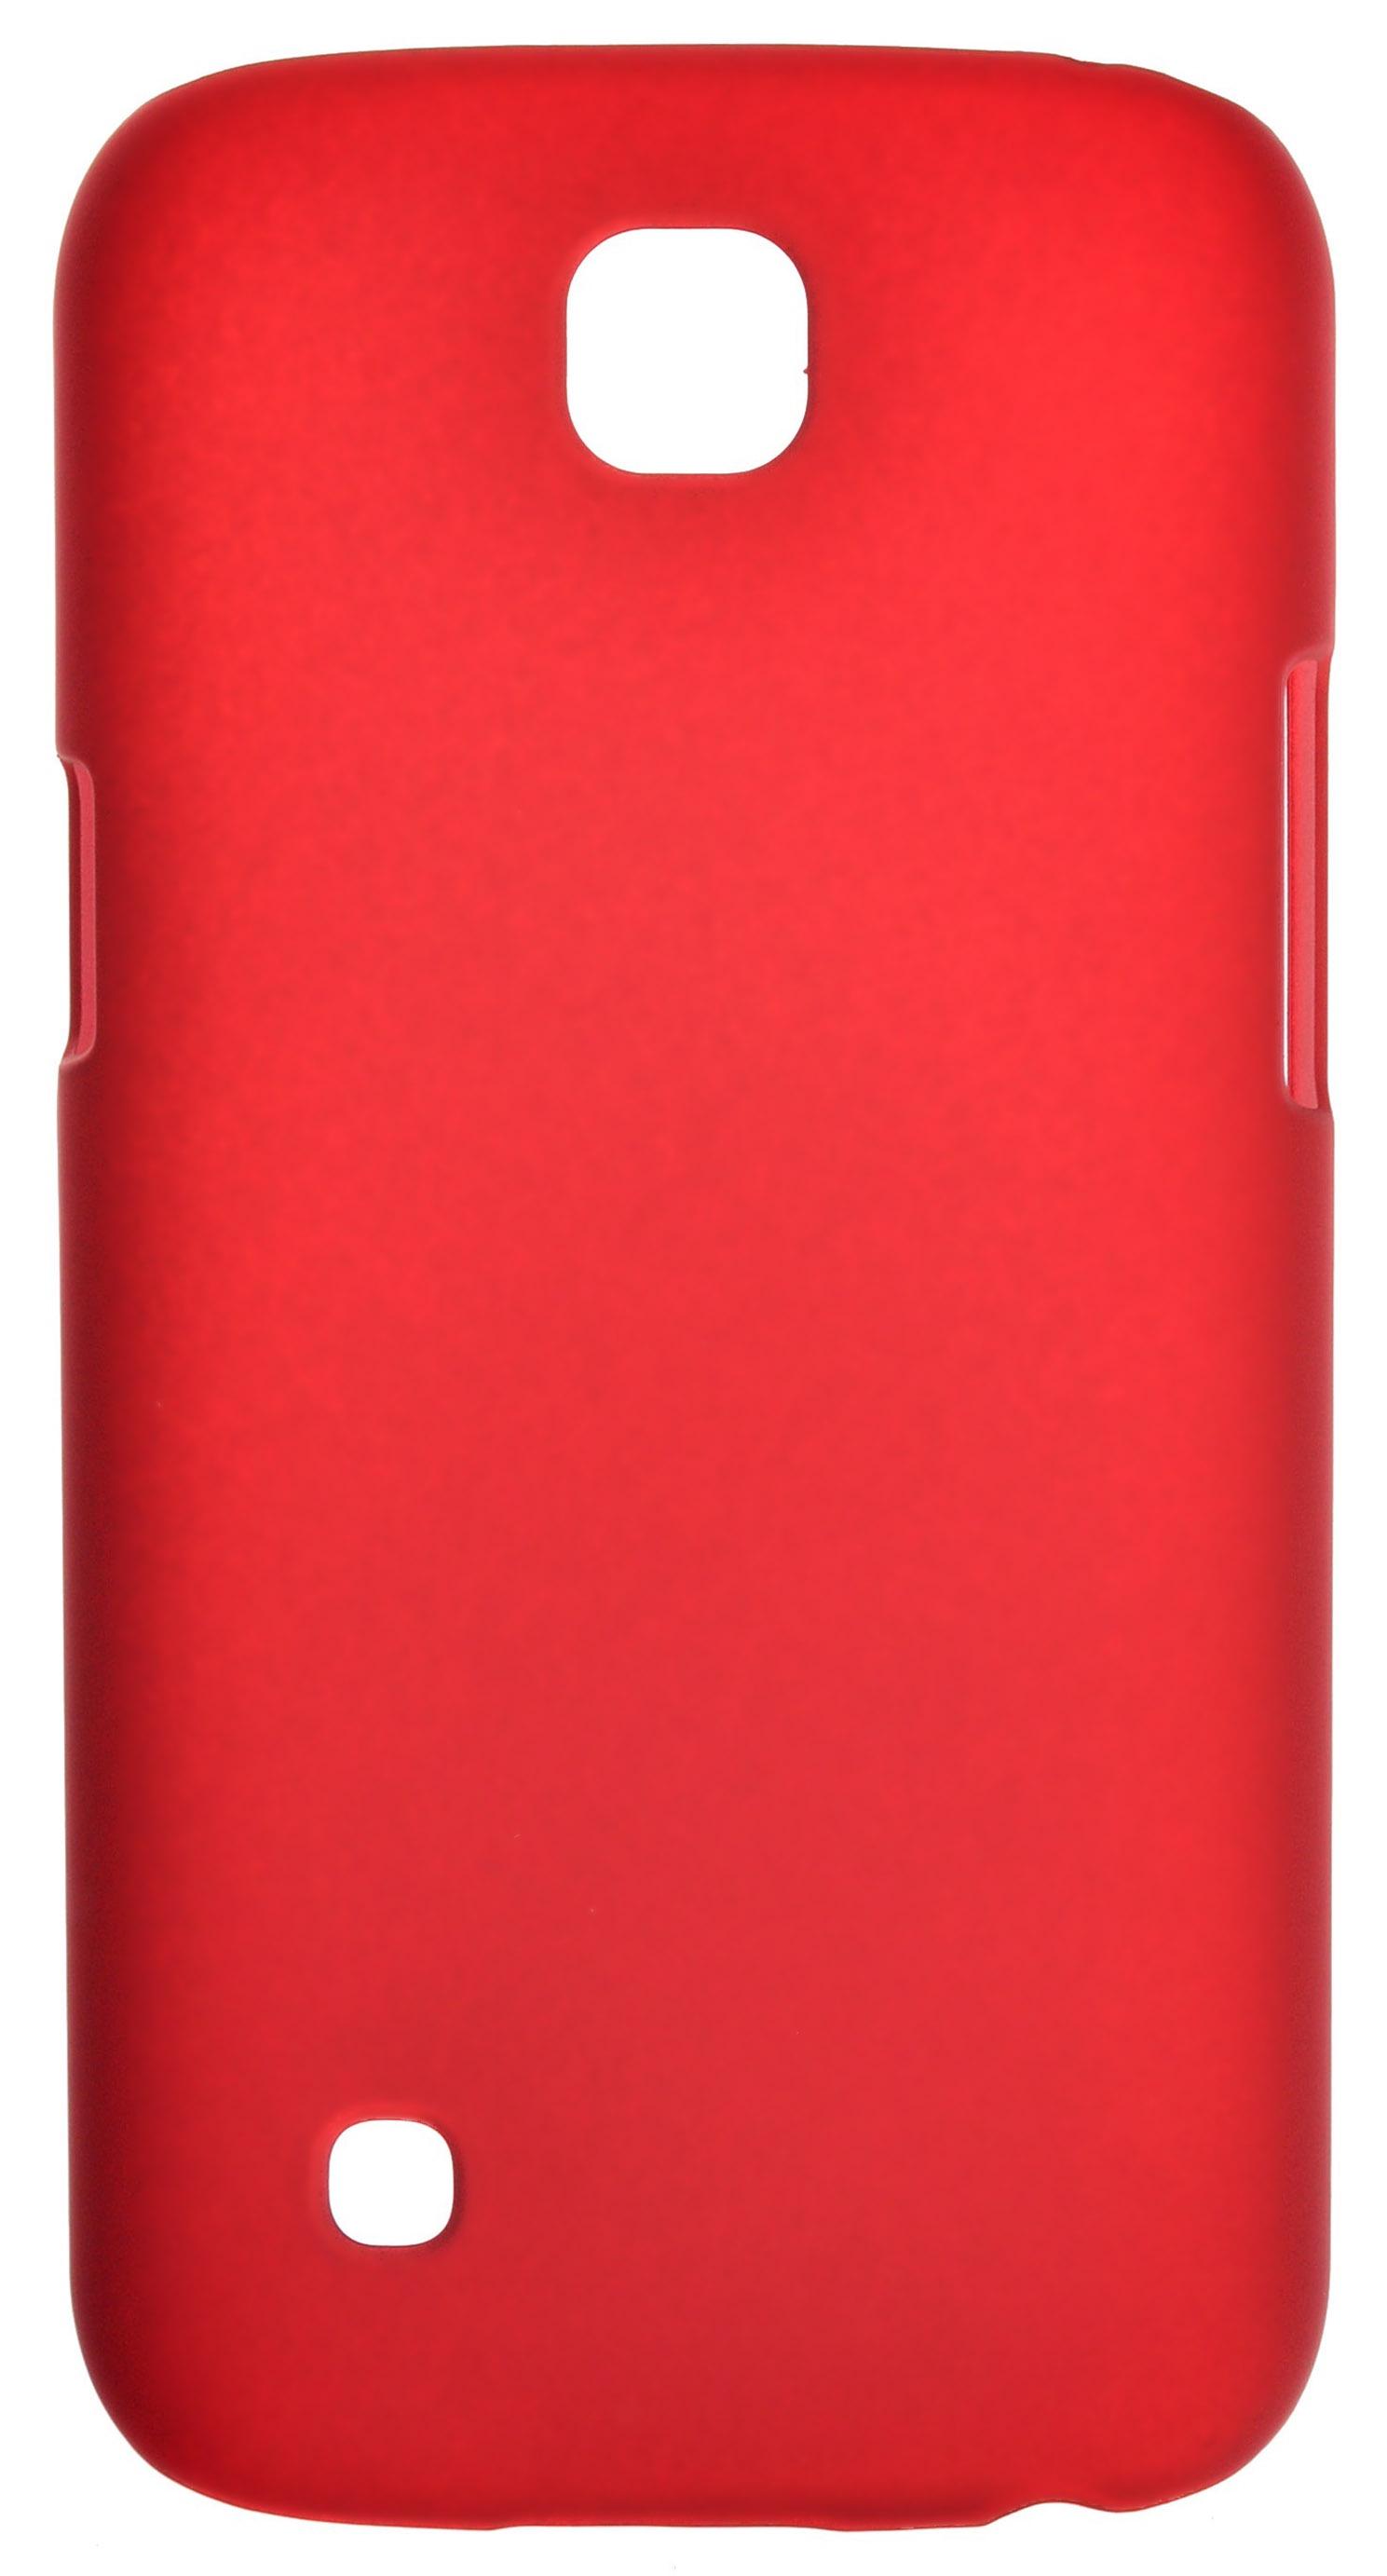 Чехол для сотового телефона skinBOX 4People, 4630042524774, красный перекл передн shimano xtr fd m9020e 2x11v боковая тяга